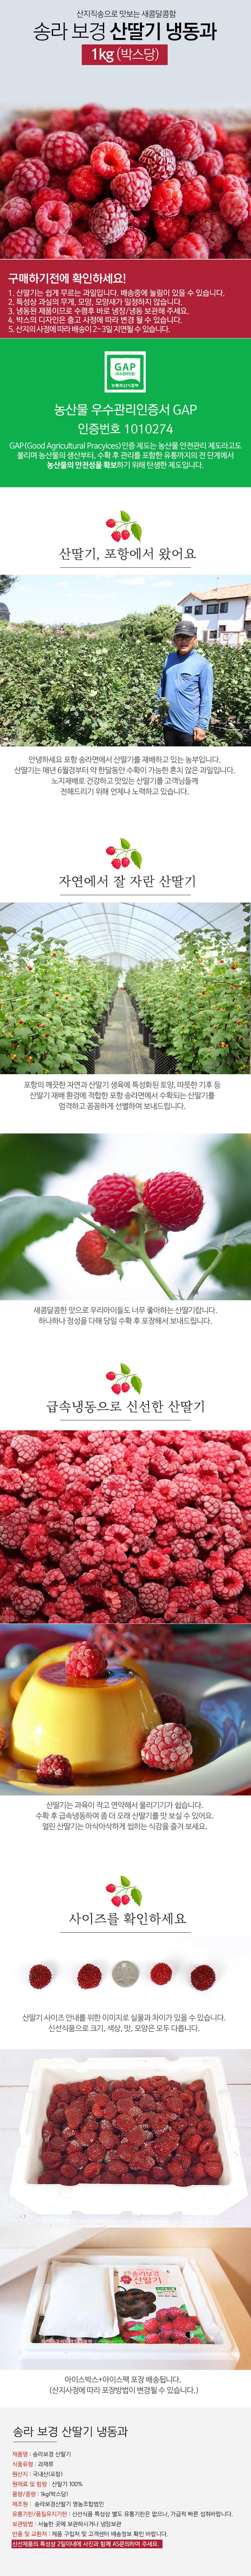 san-strawberry.jpg